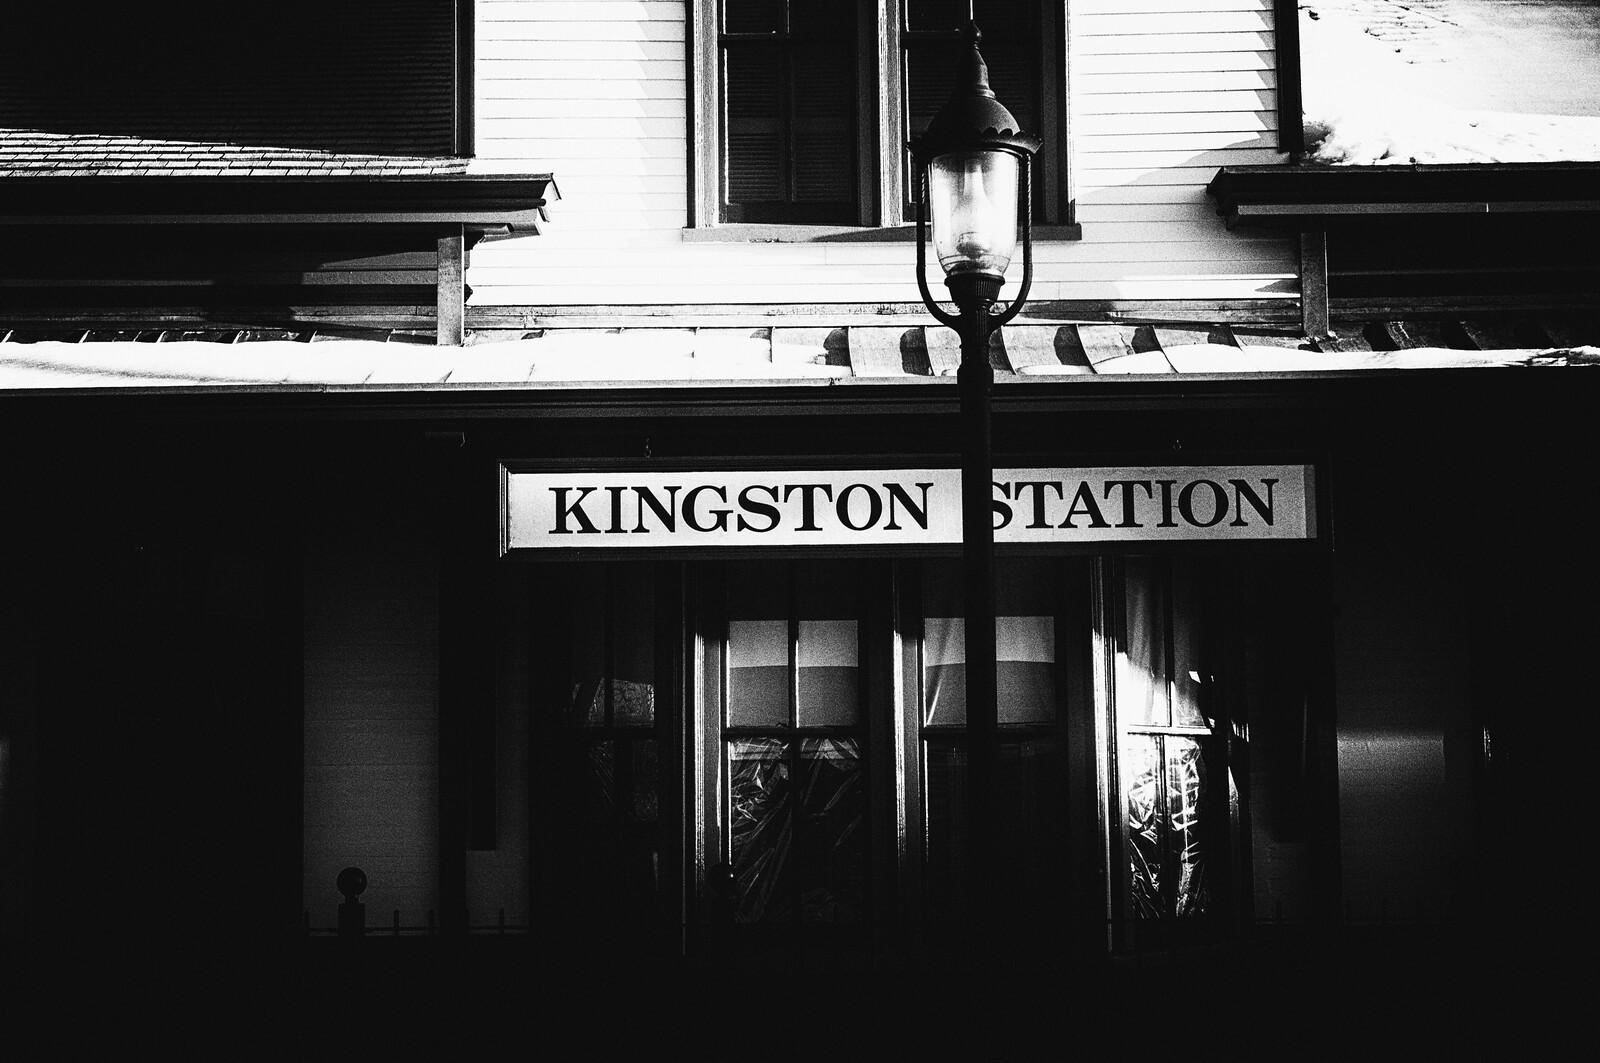 Kingston Station